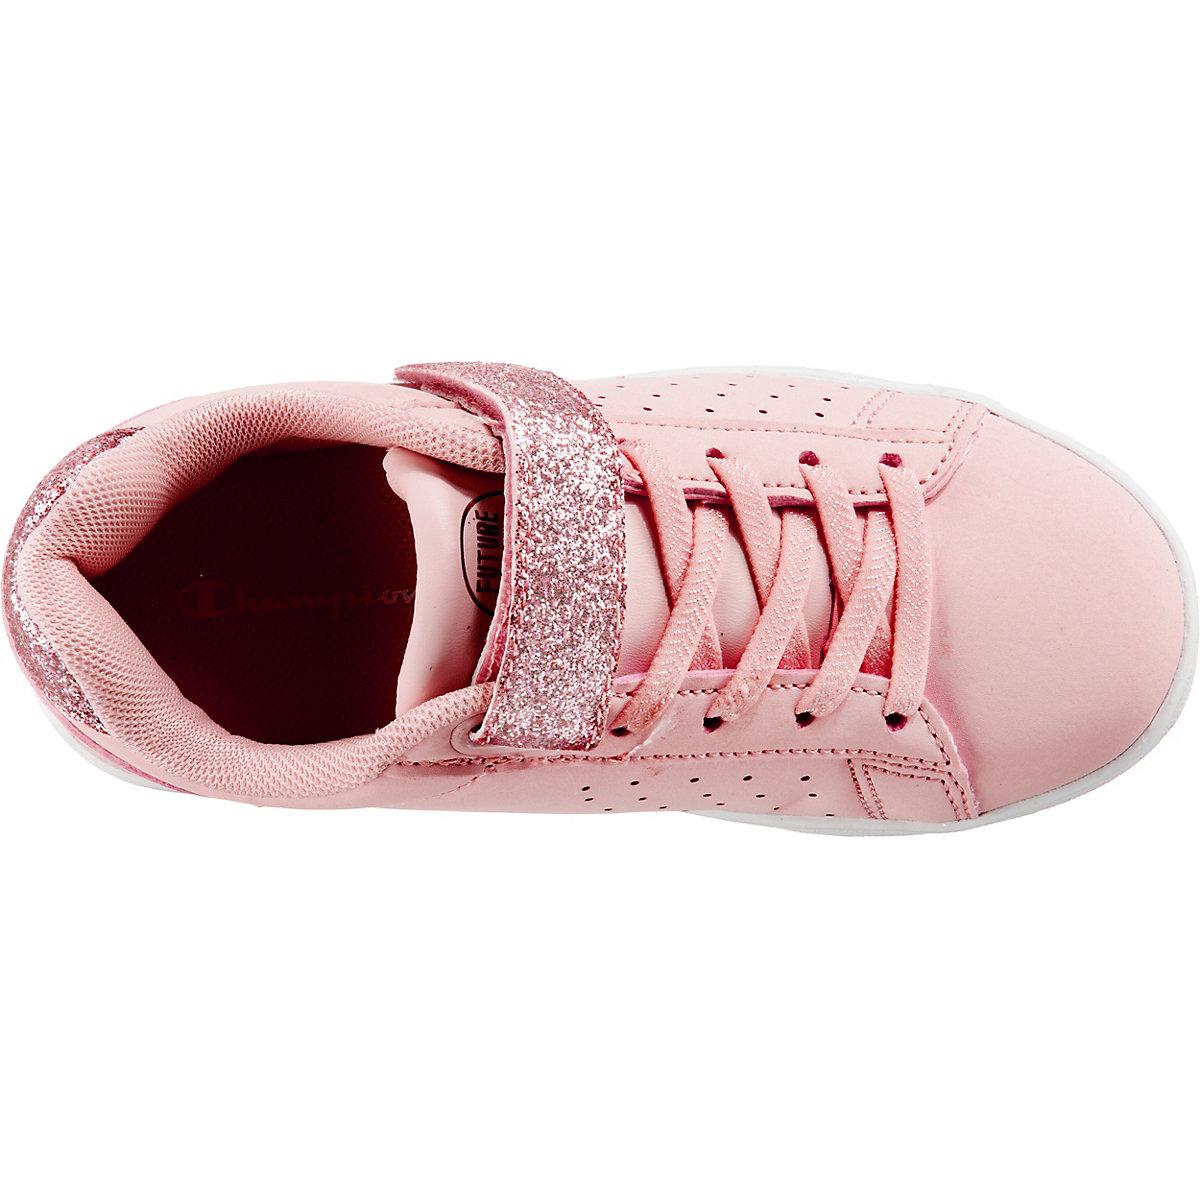 Champion, Sneakers Low Alexia G Ps Für Mädchen, Rosa